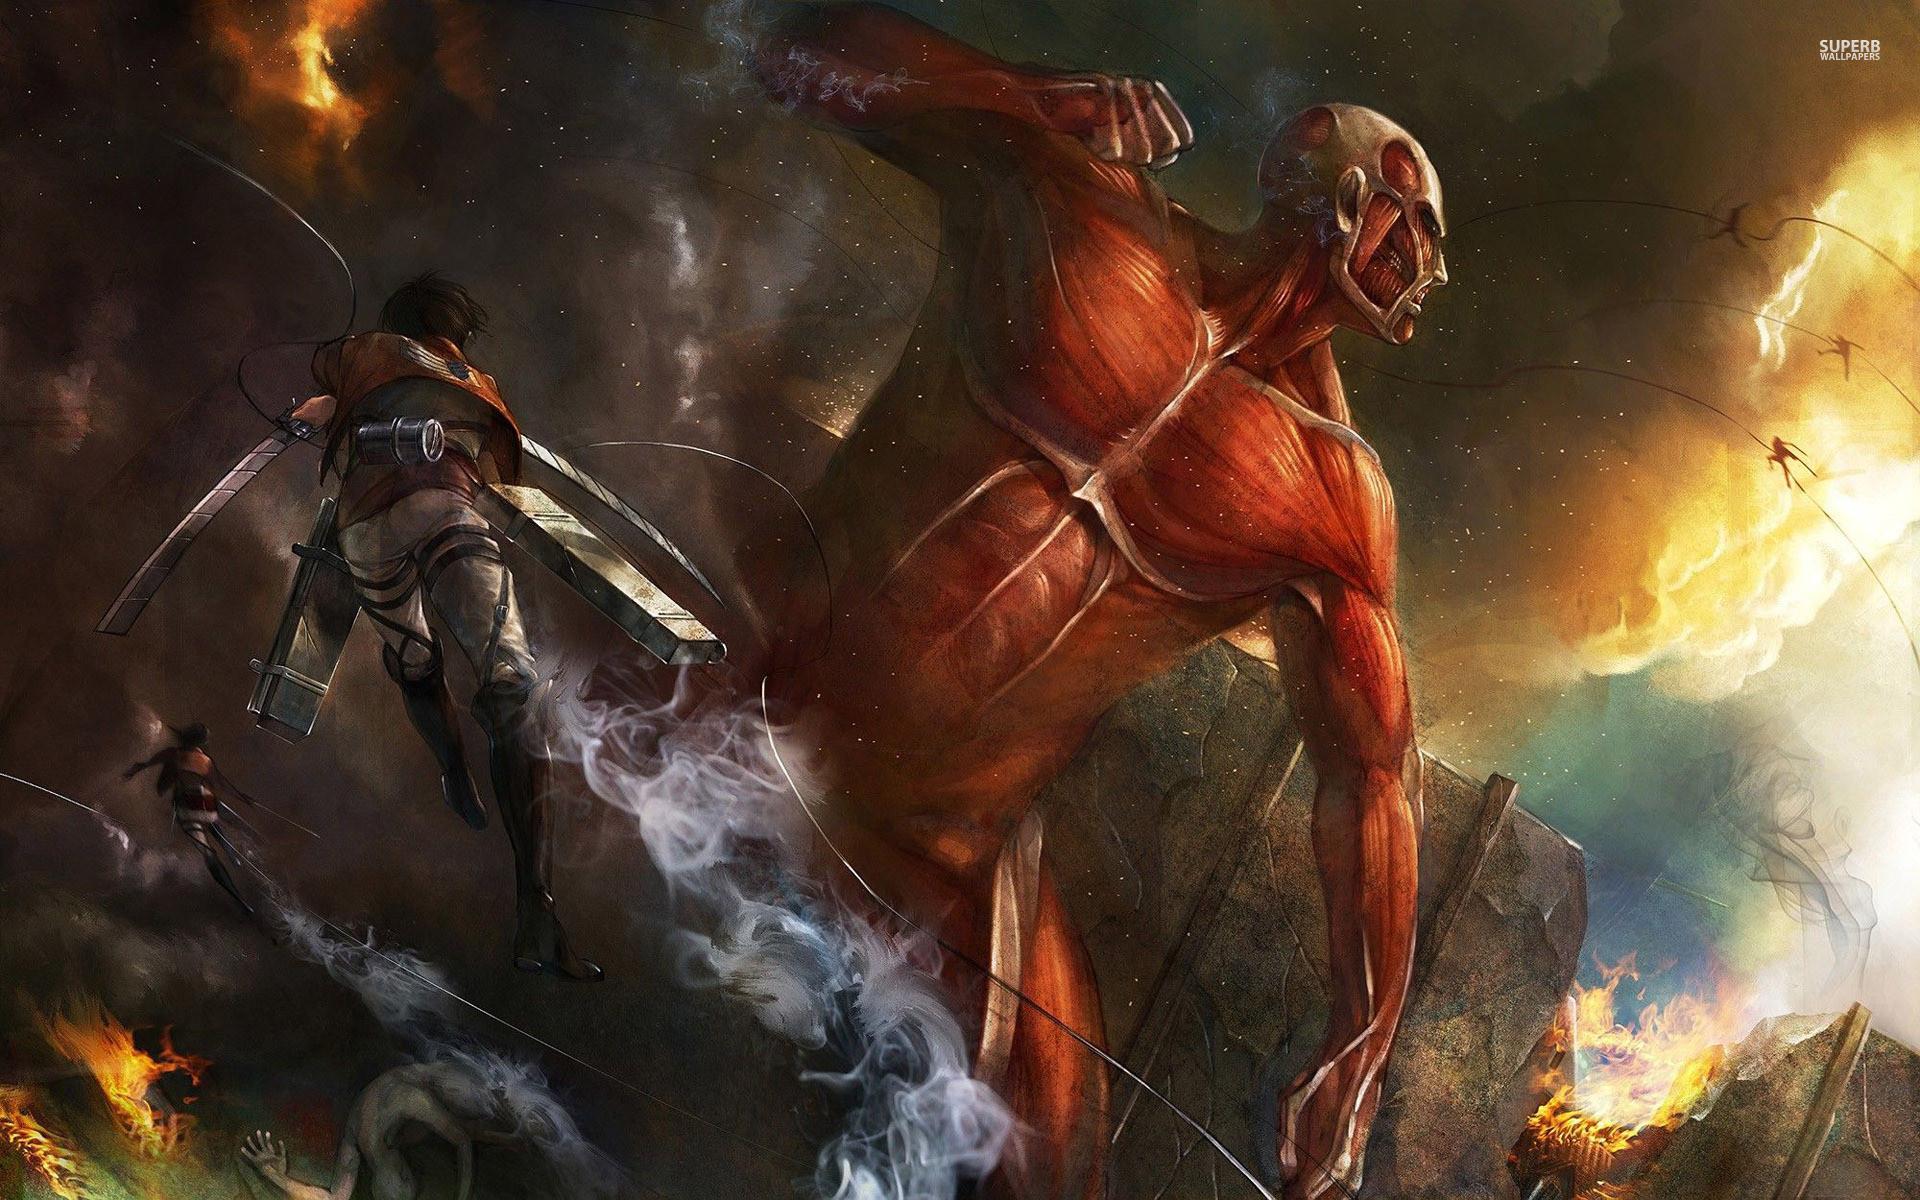 Attack on Titan HD Wallpaper